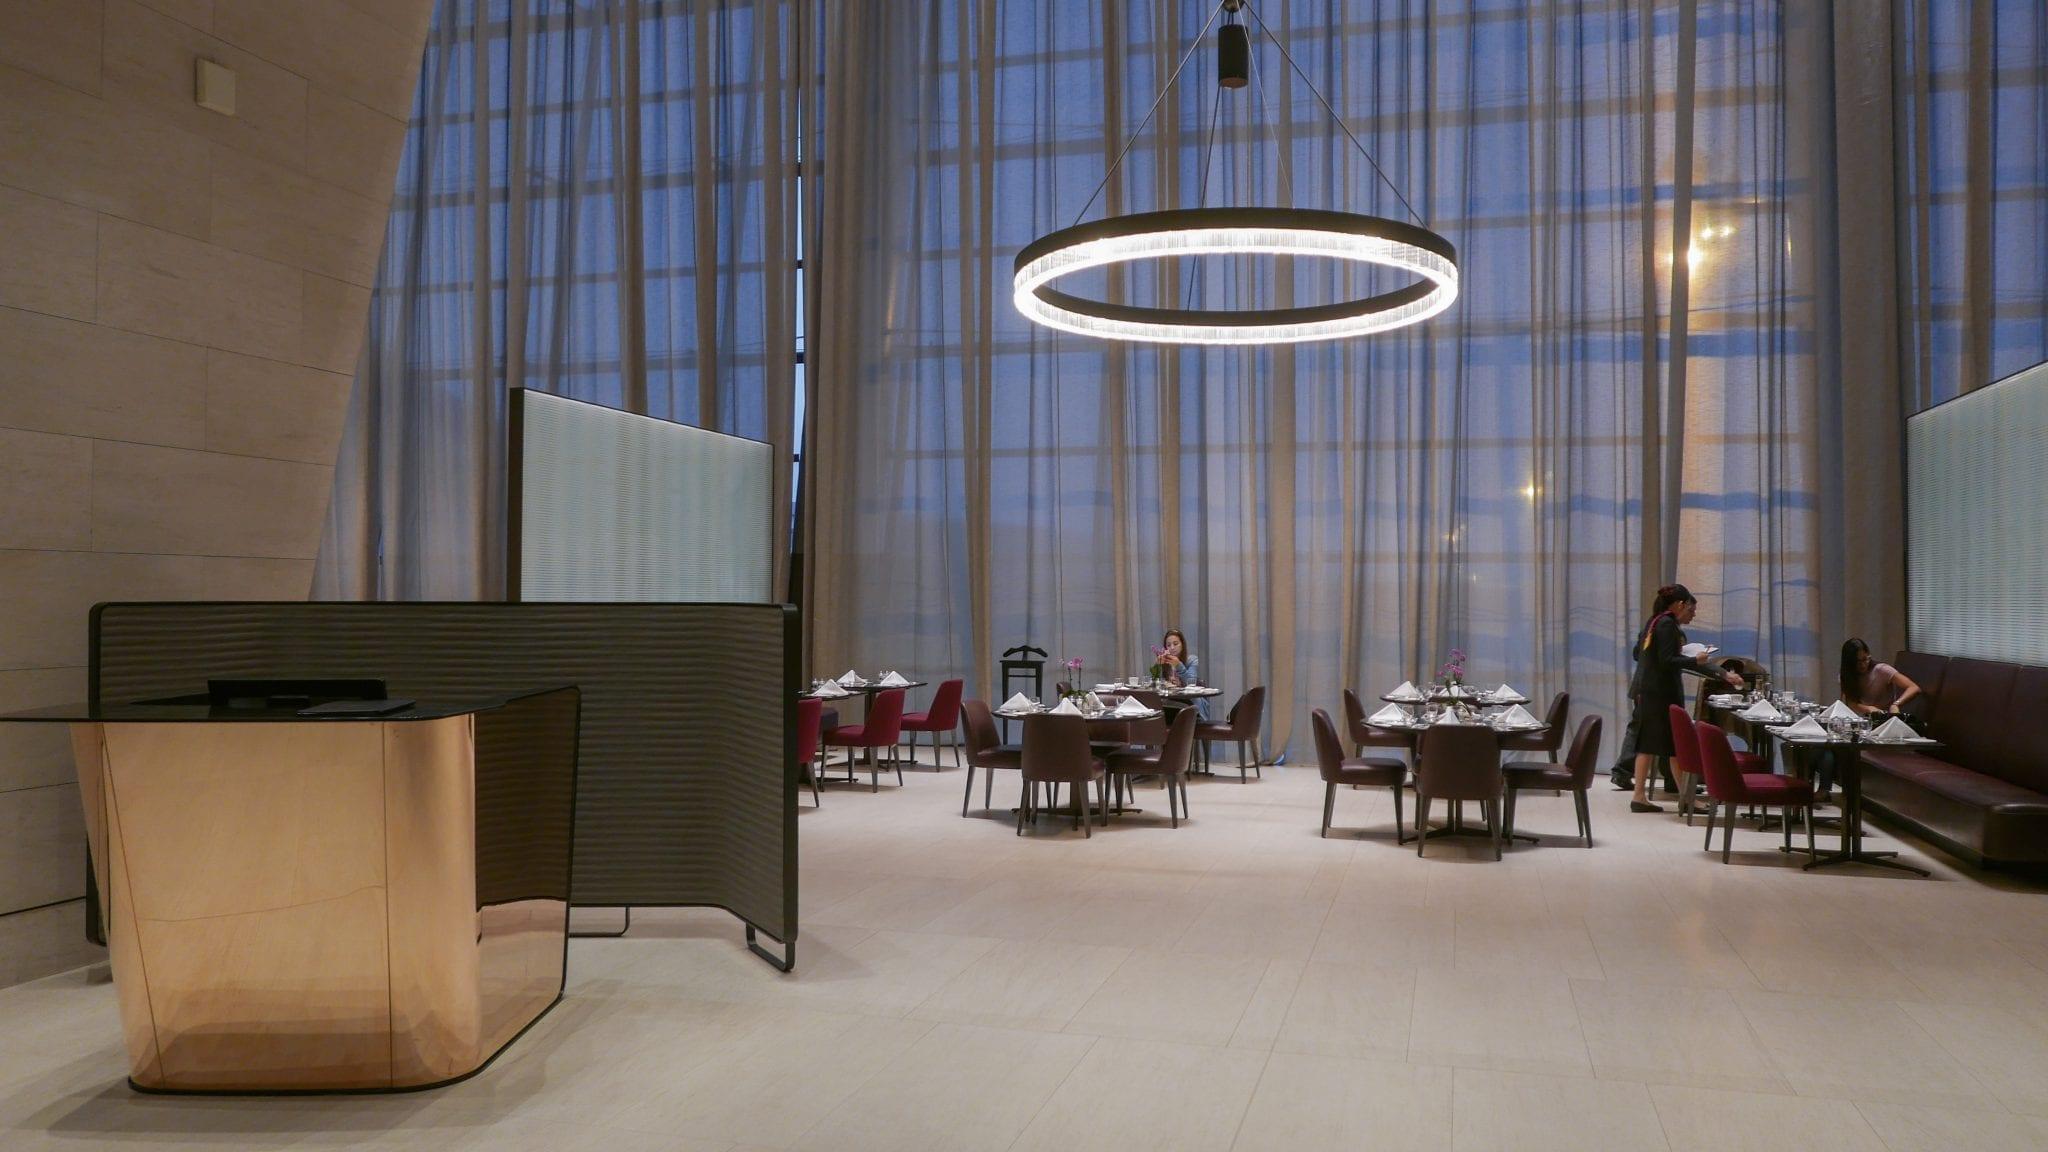 al safwa 5 - REVIEW - Qatar Al Safwa First Class Lounge - Doha